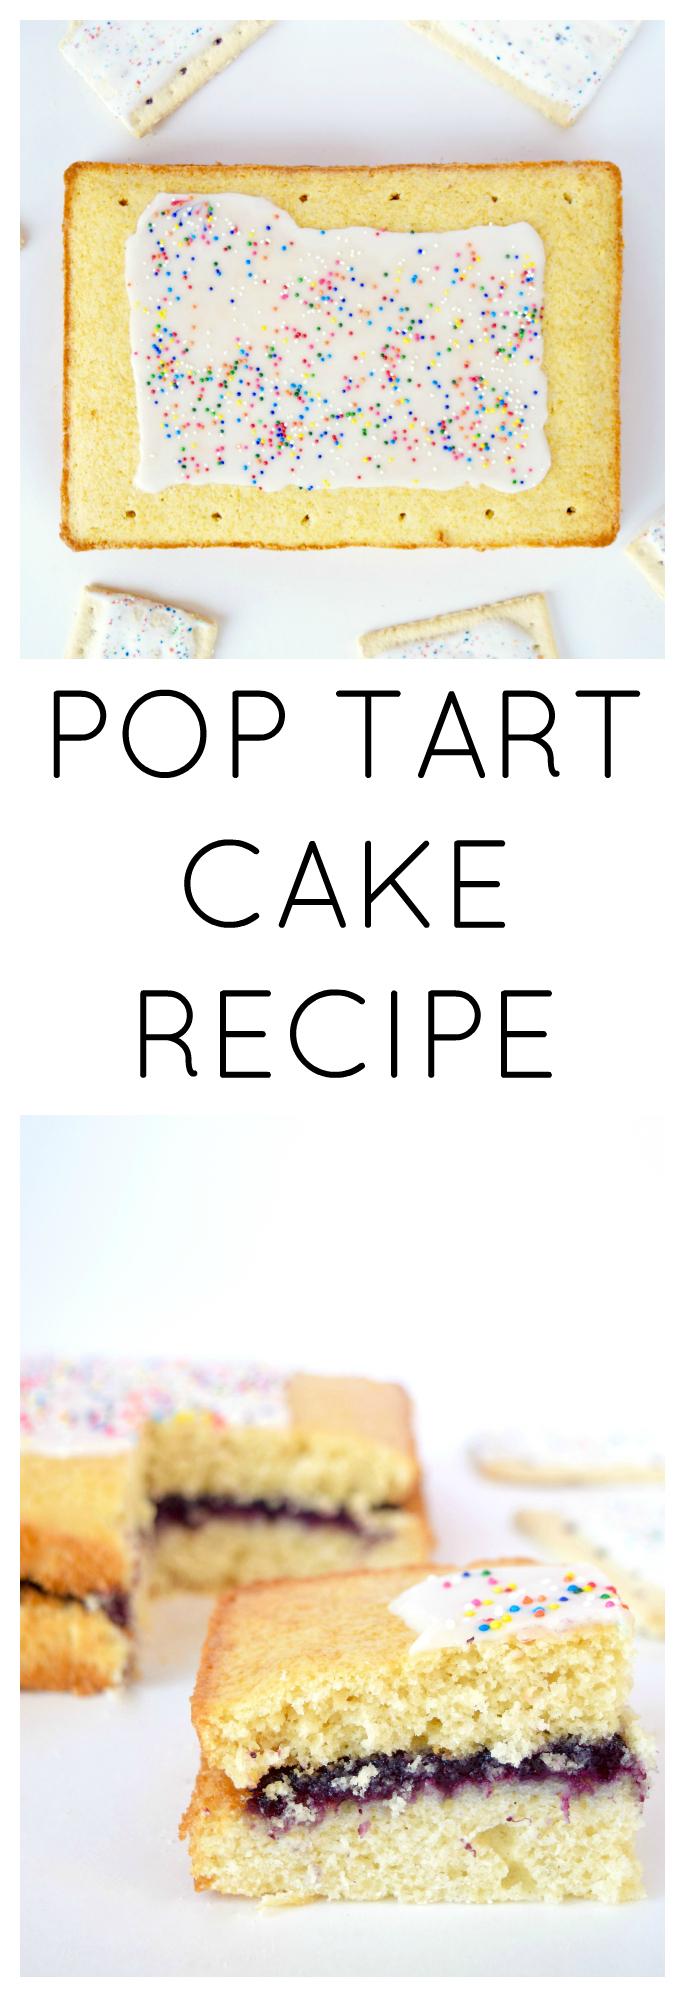 POP TART CAKE RECIPE